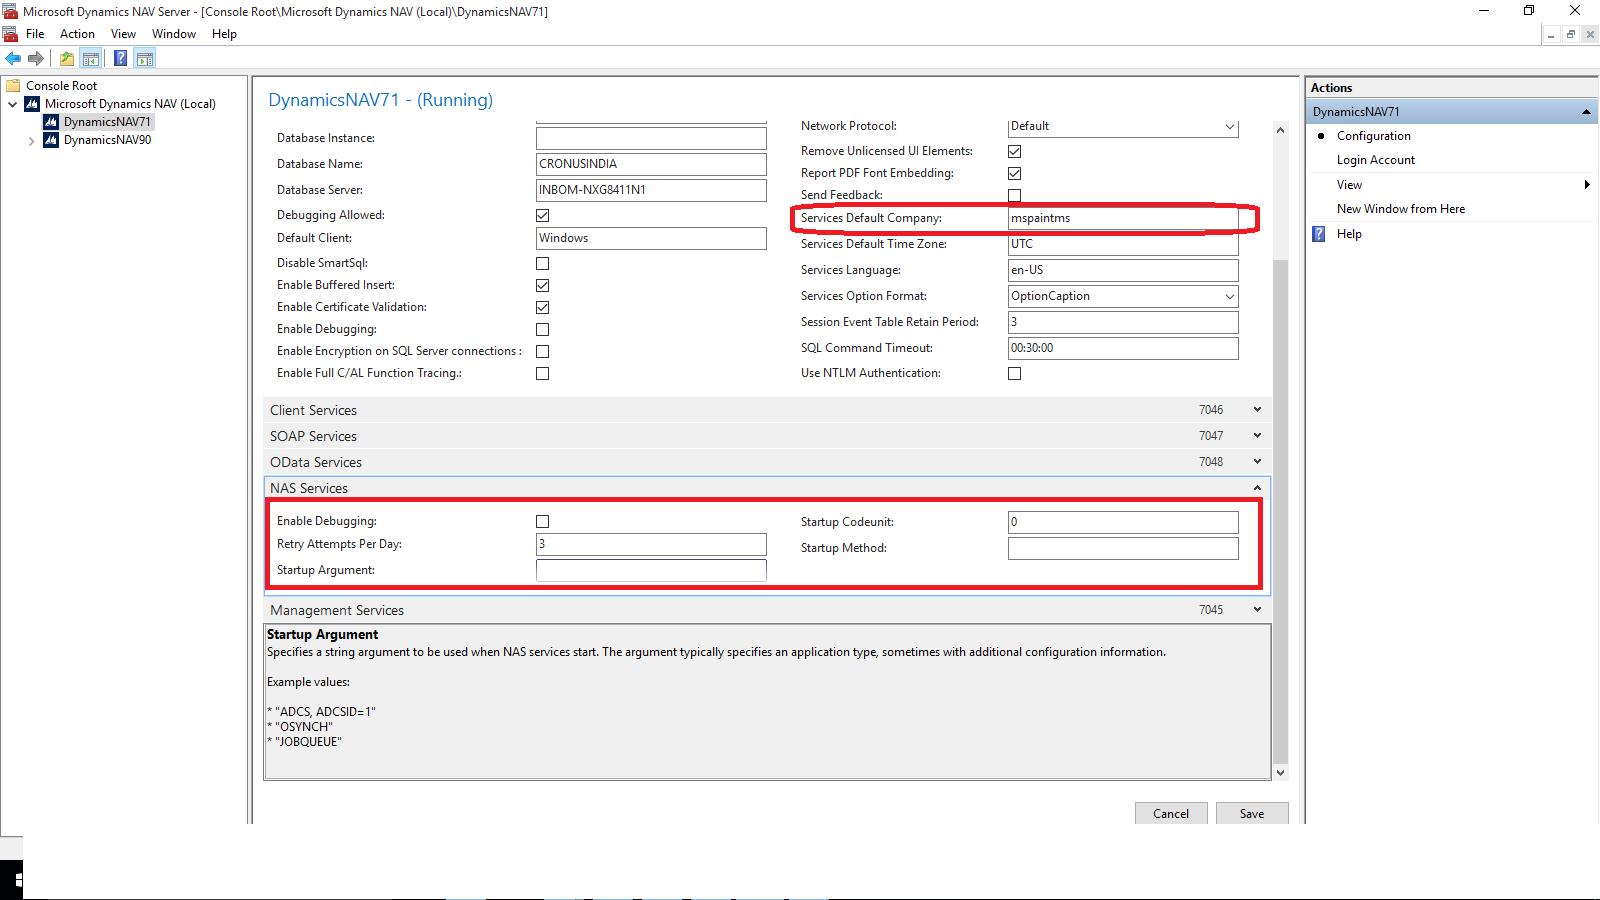 microsoft dynamics nav 2013 r2 user manual